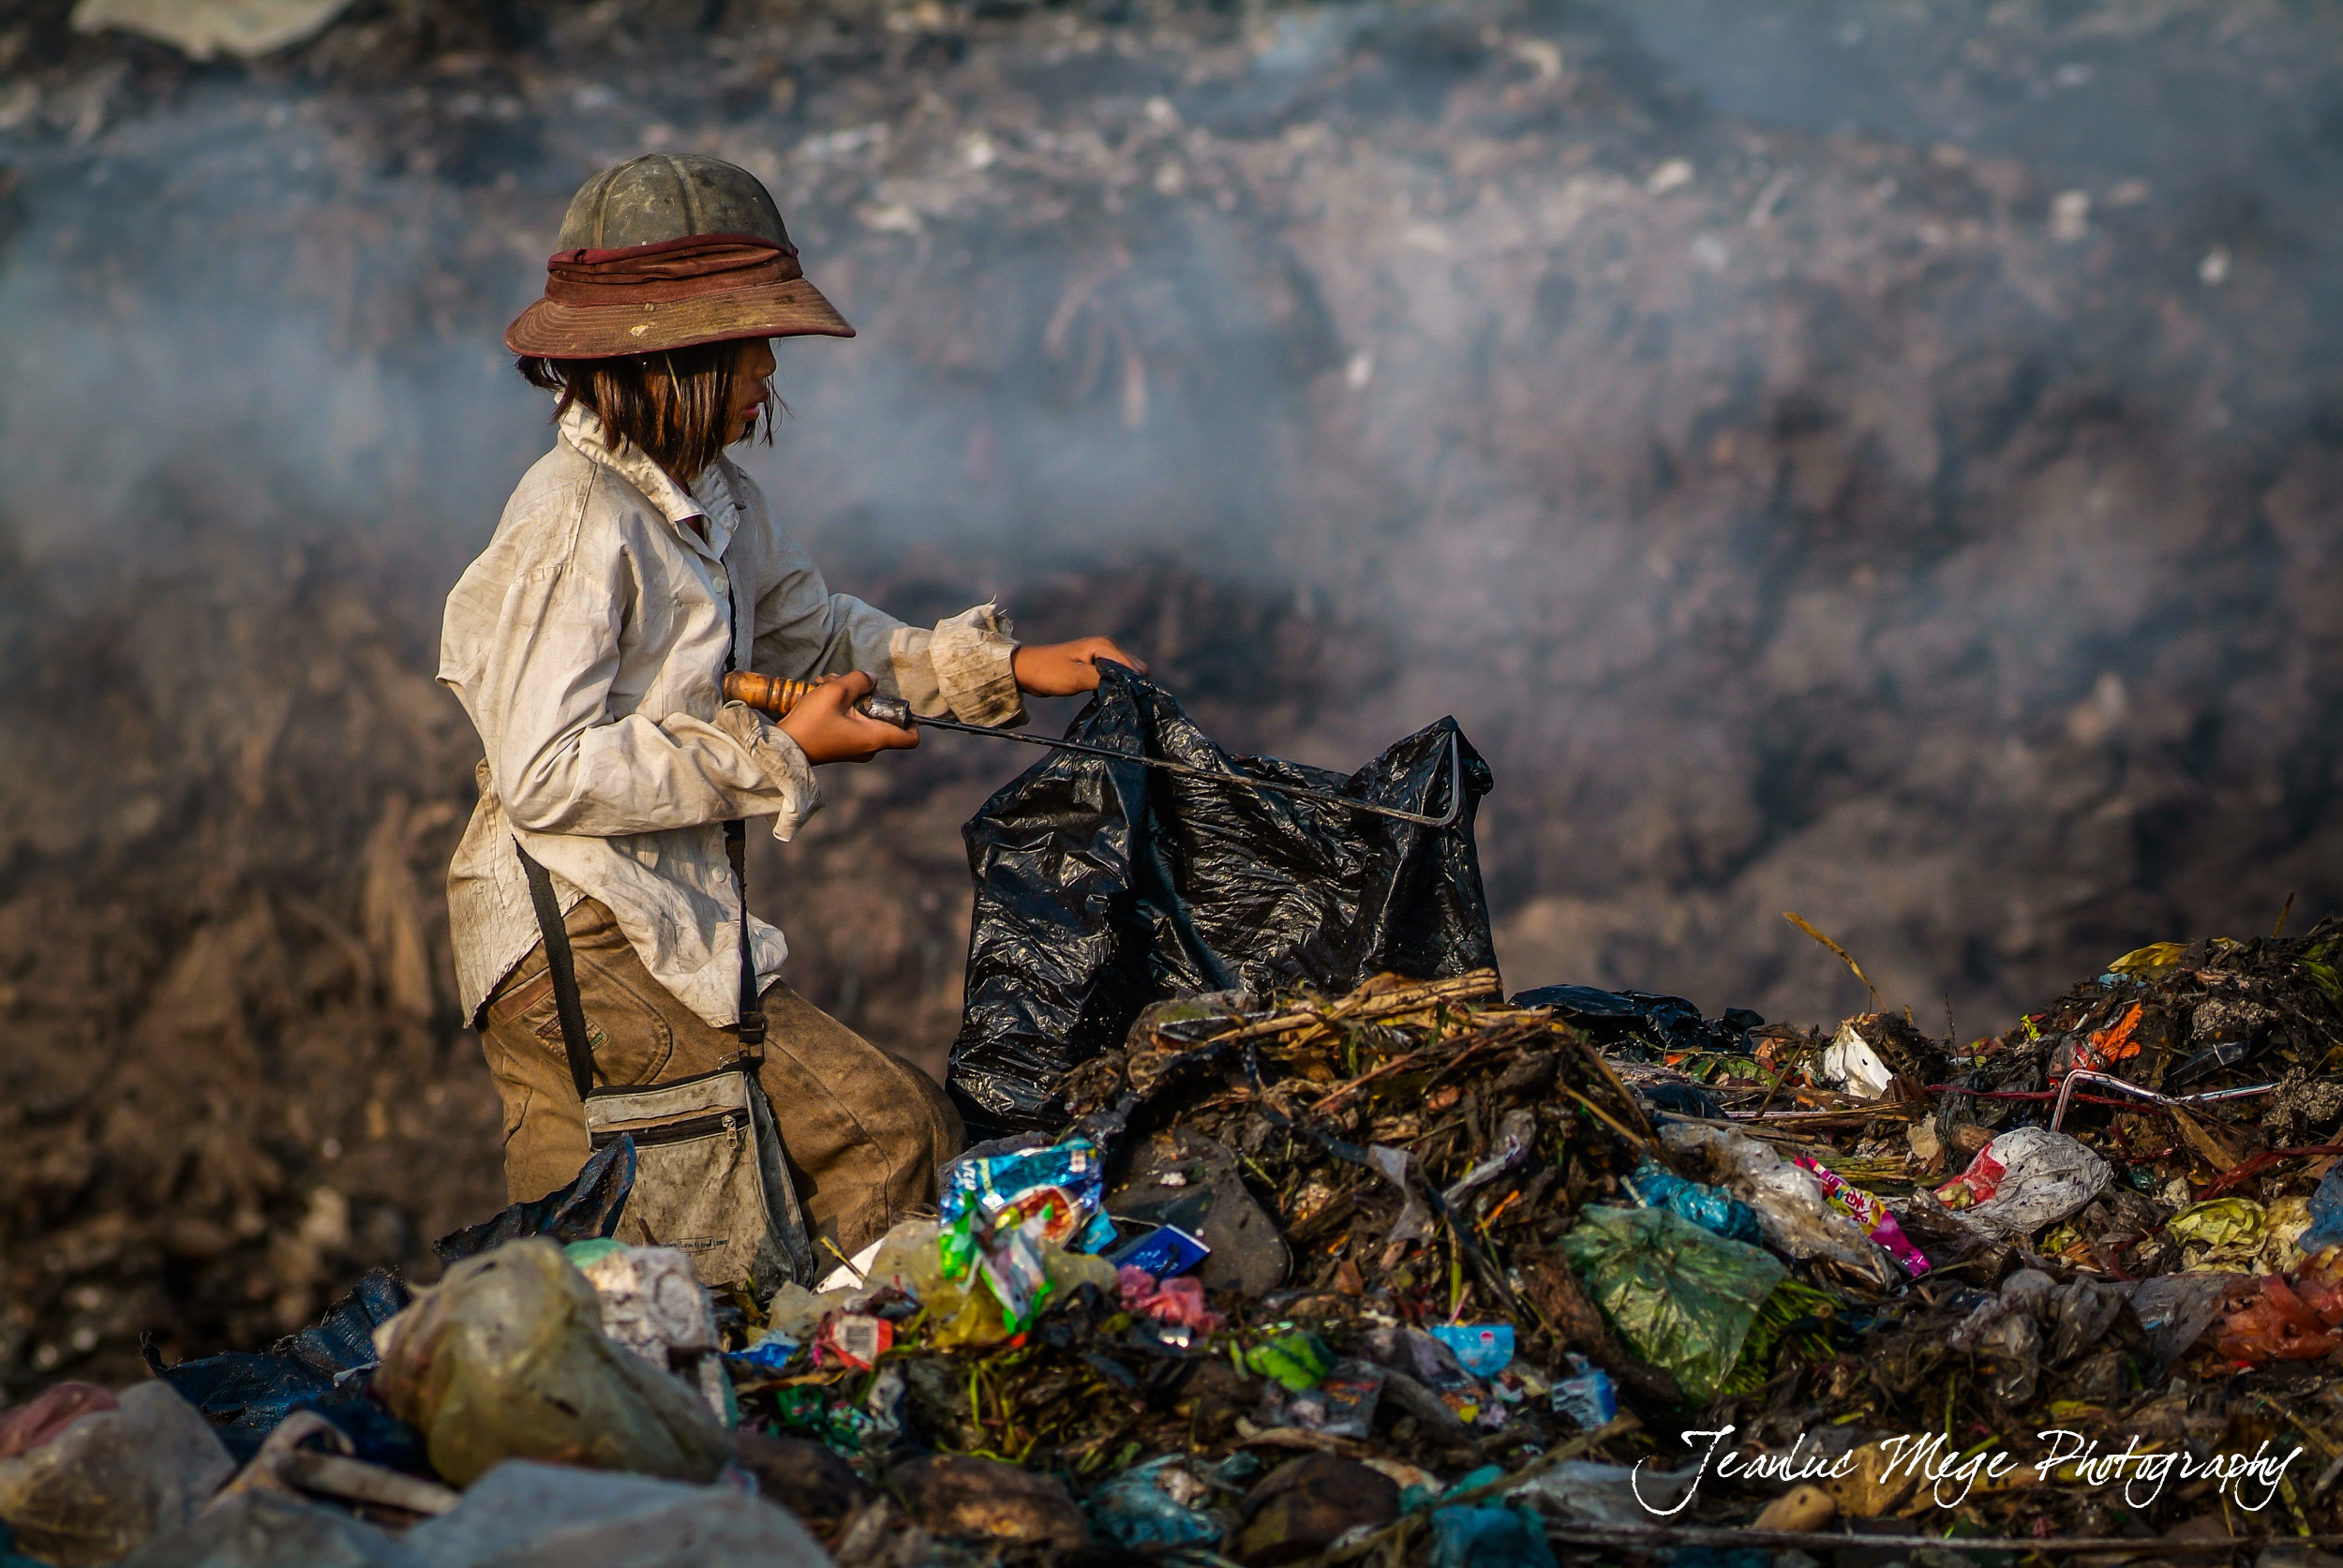 Jean Luc Mege Cambodia-8432.jpg